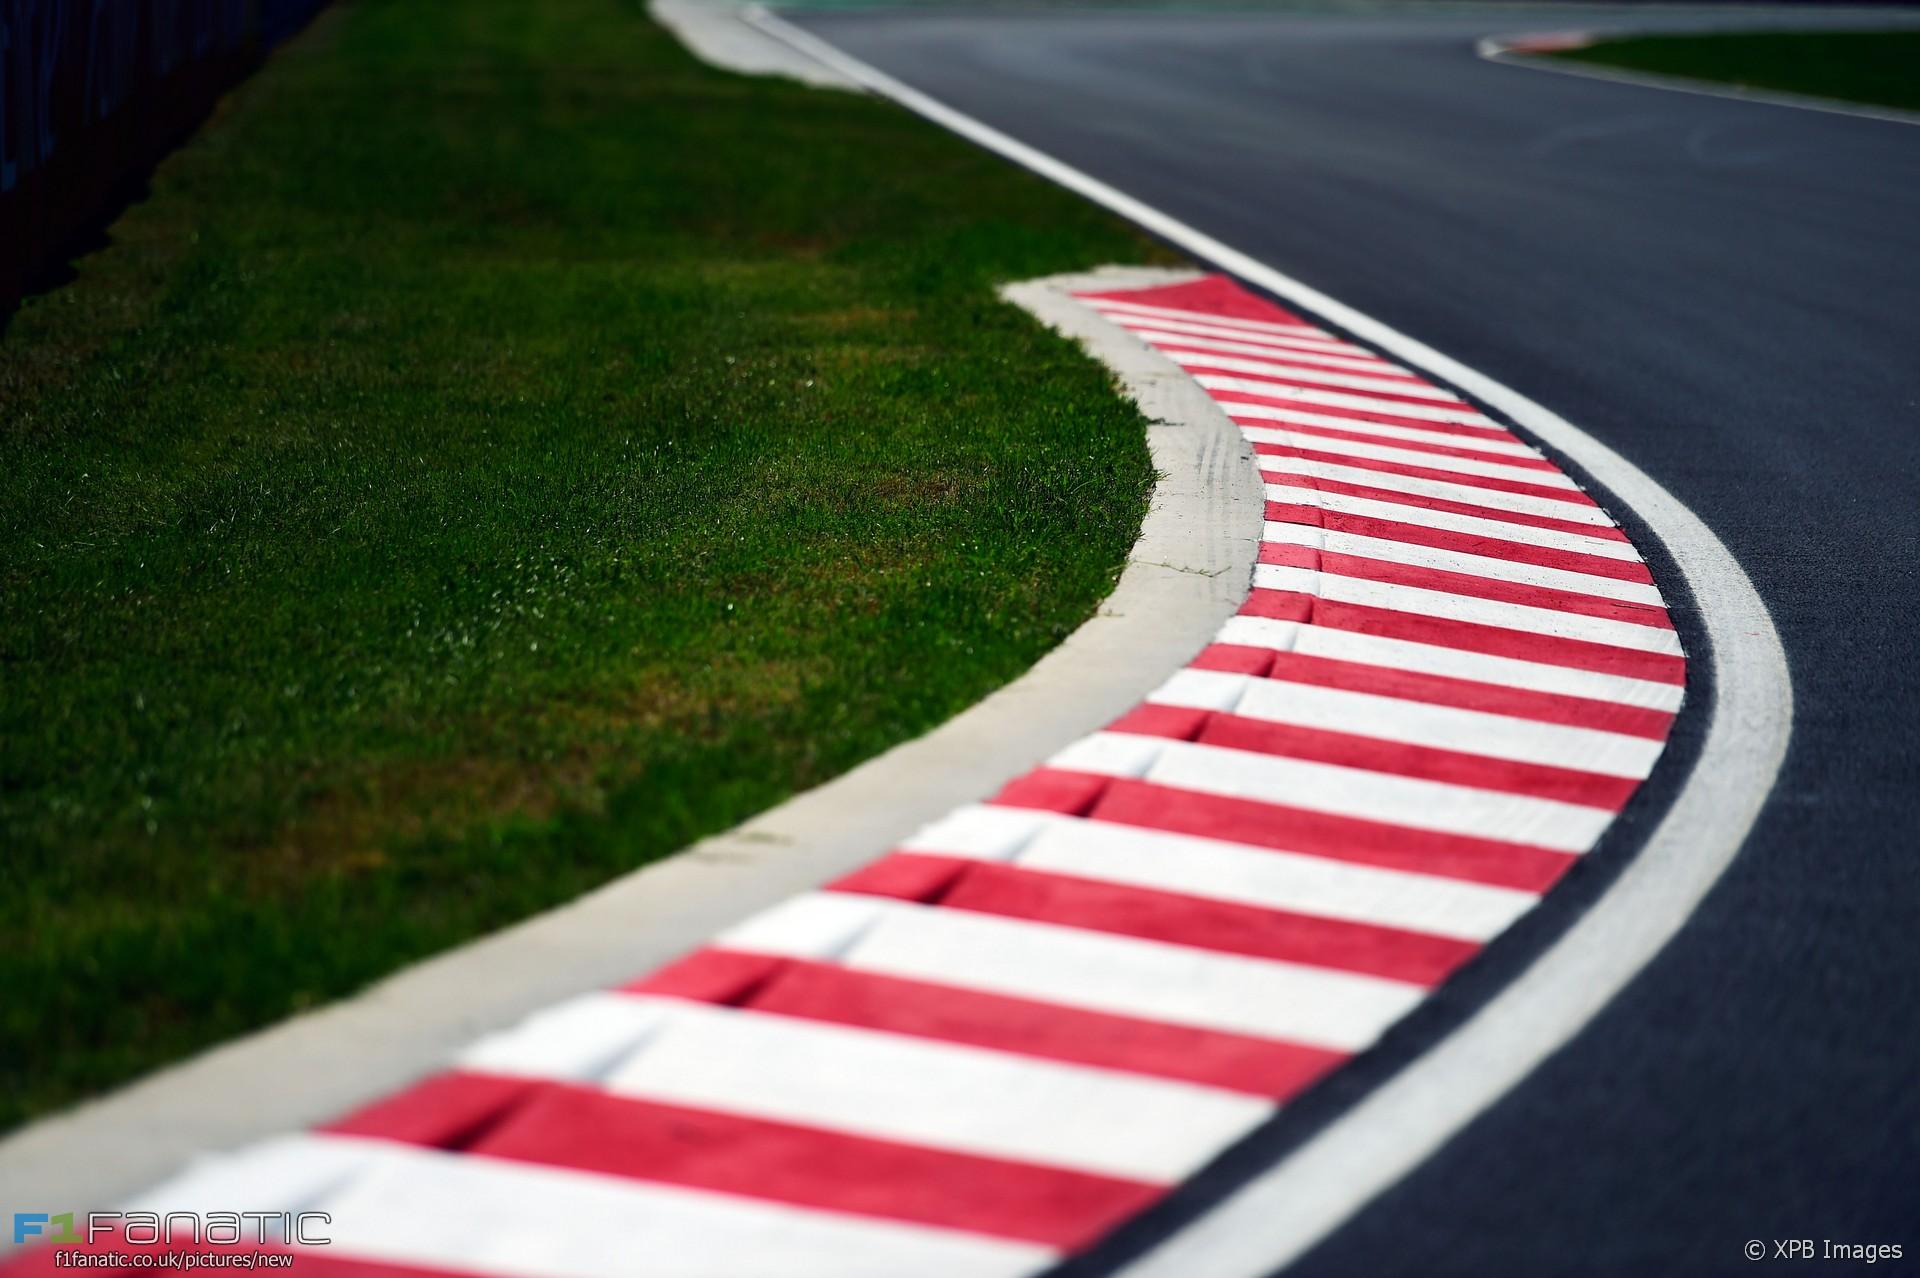 F1, f1 news, f1 analysis, autosport, jonathan noble